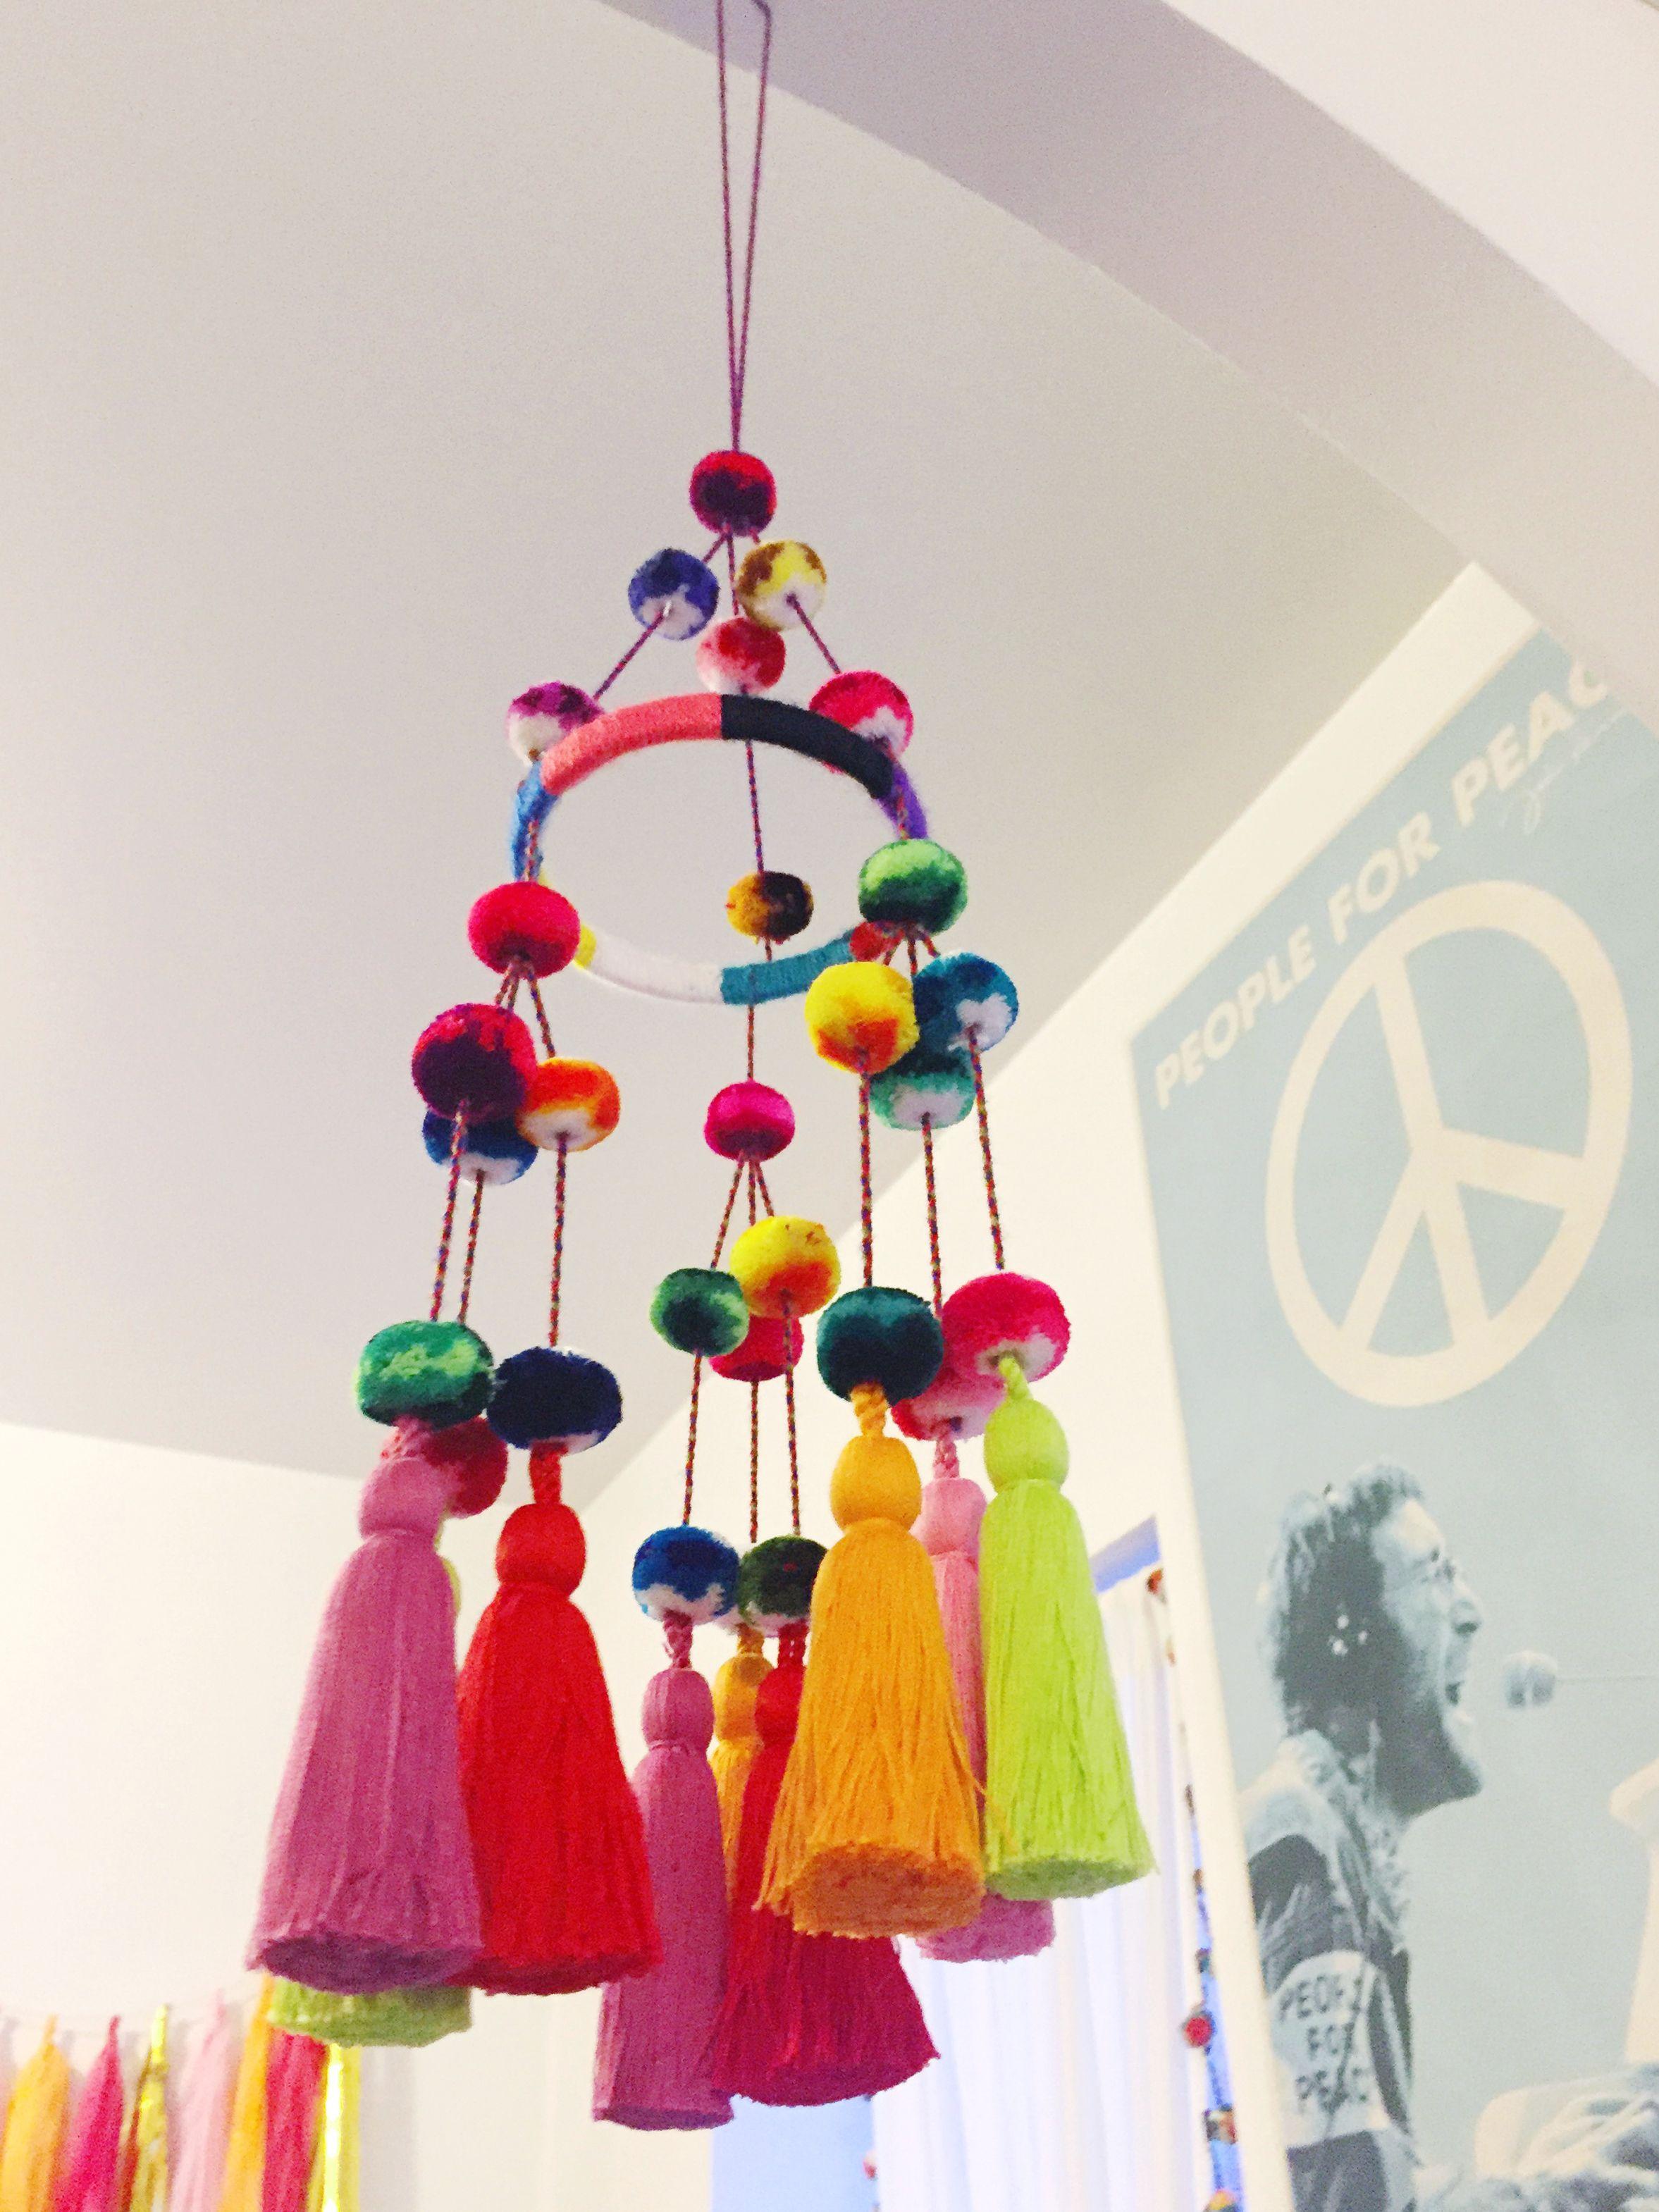 DIY Pompom Chandelier   Paper chandelier, Craft and DIY ideas for Paper Chandelier Craft  146hul